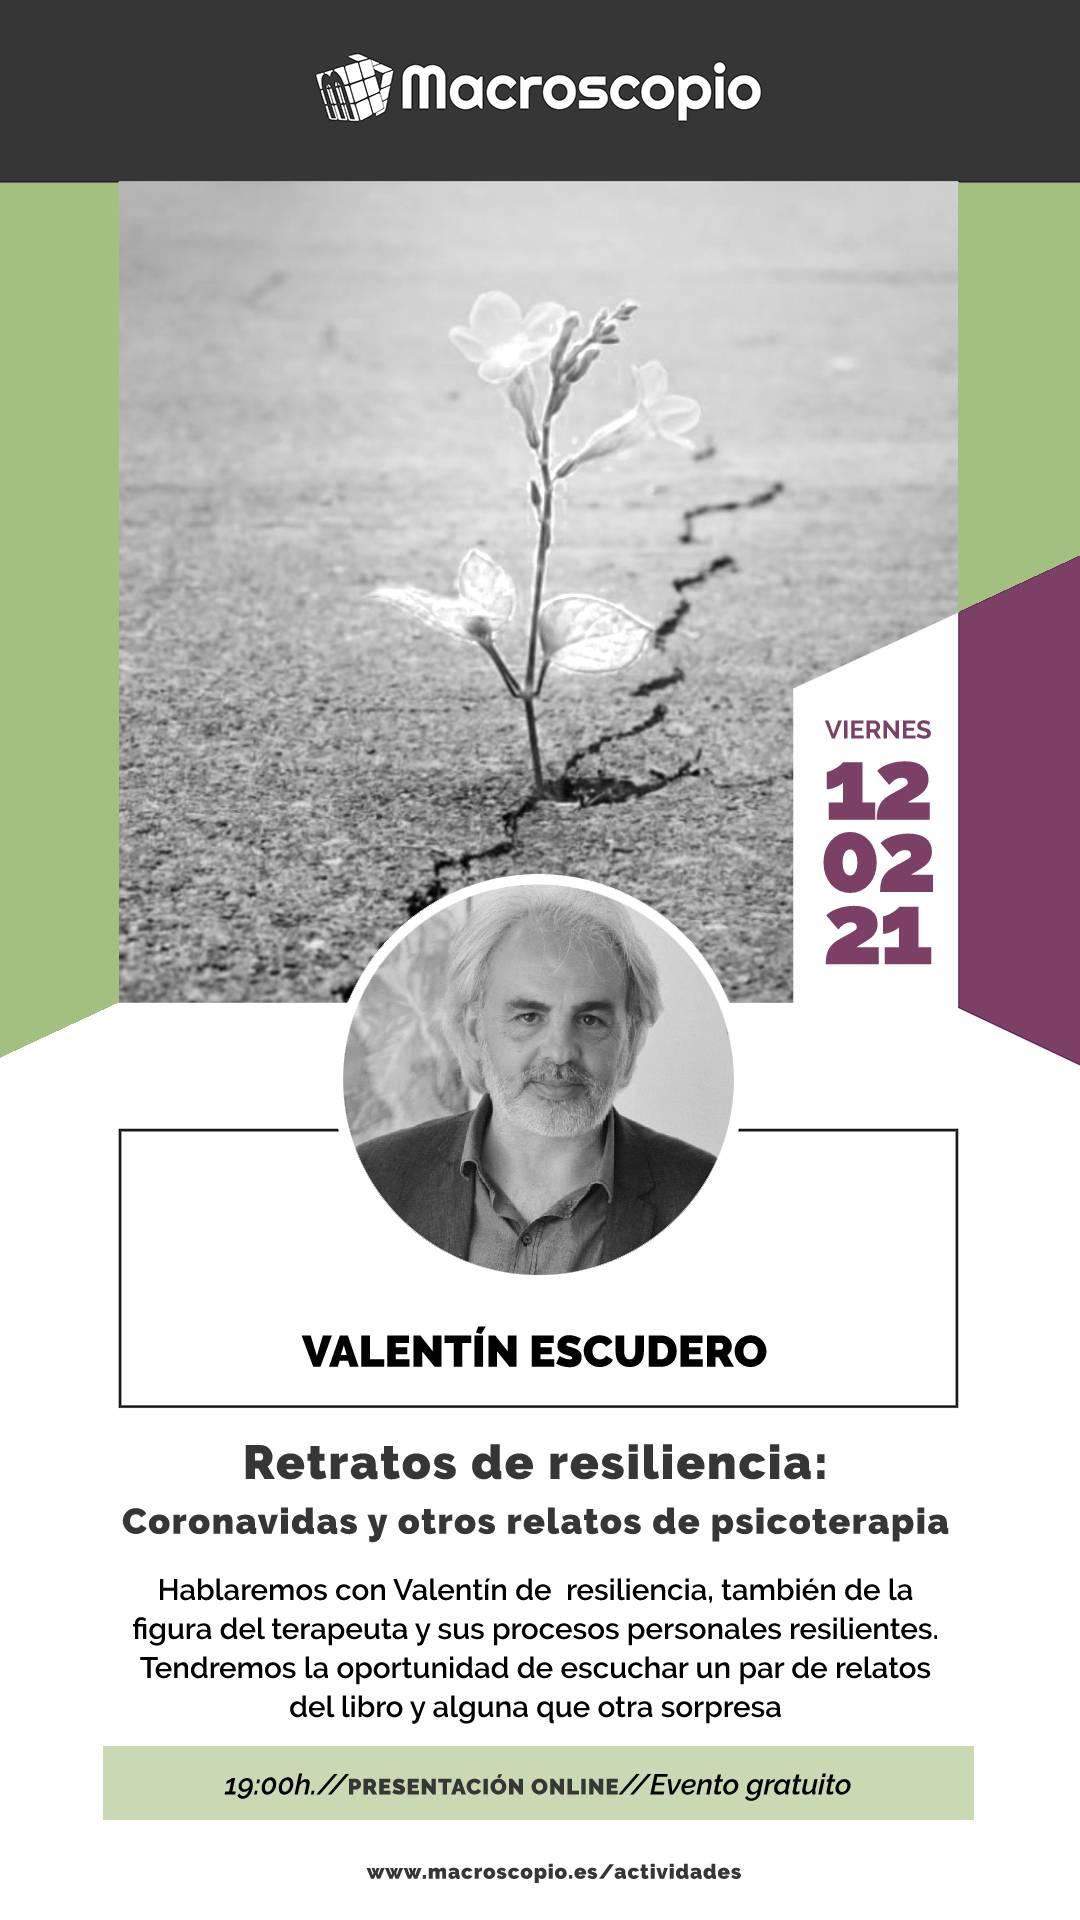 Retratos de resiliencia evento en Macroscopio